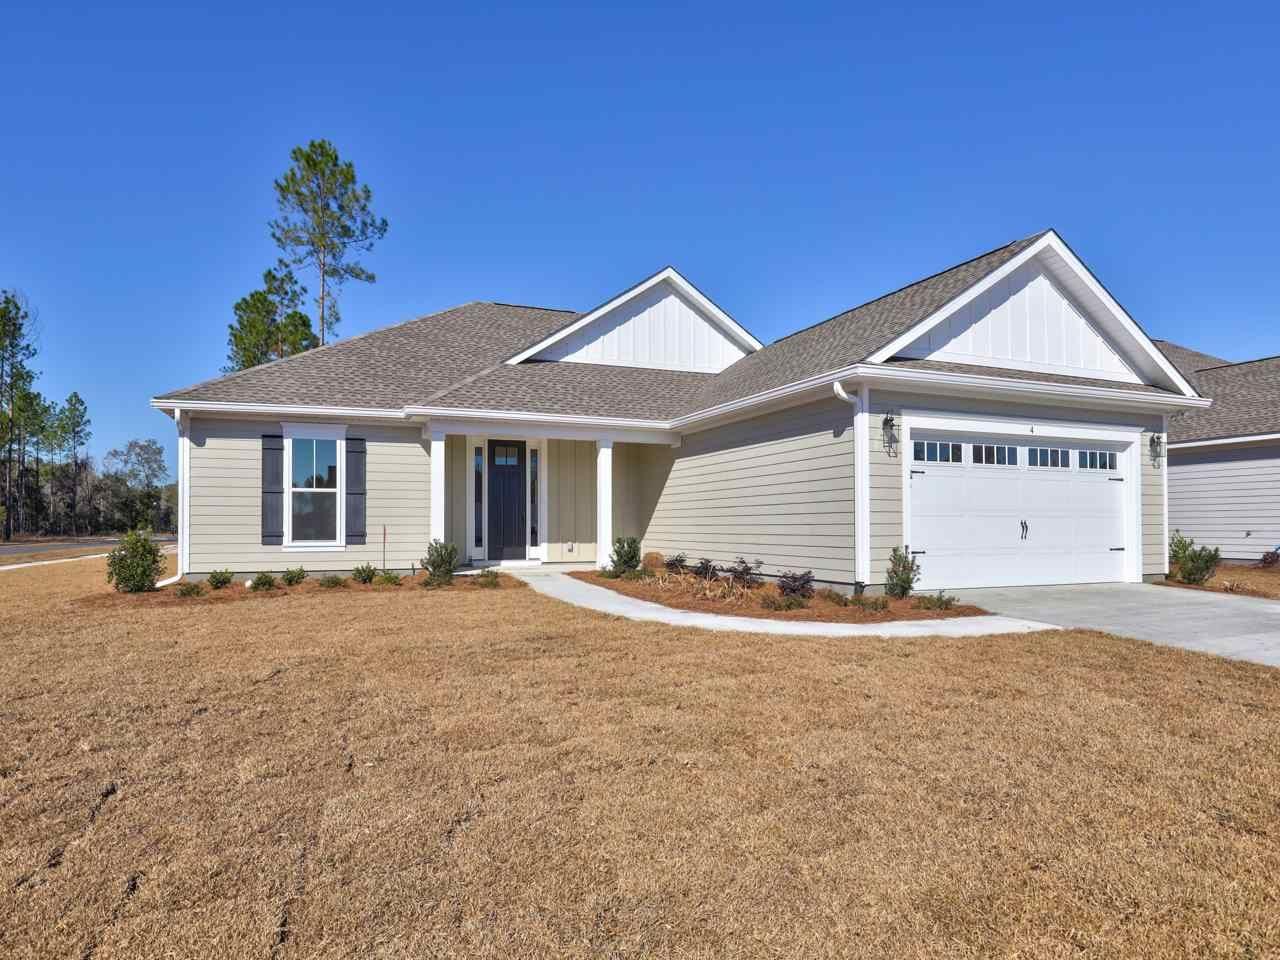 75 Stillmont Drive, Crawfordville, FL 32327 - MLS#: 337540